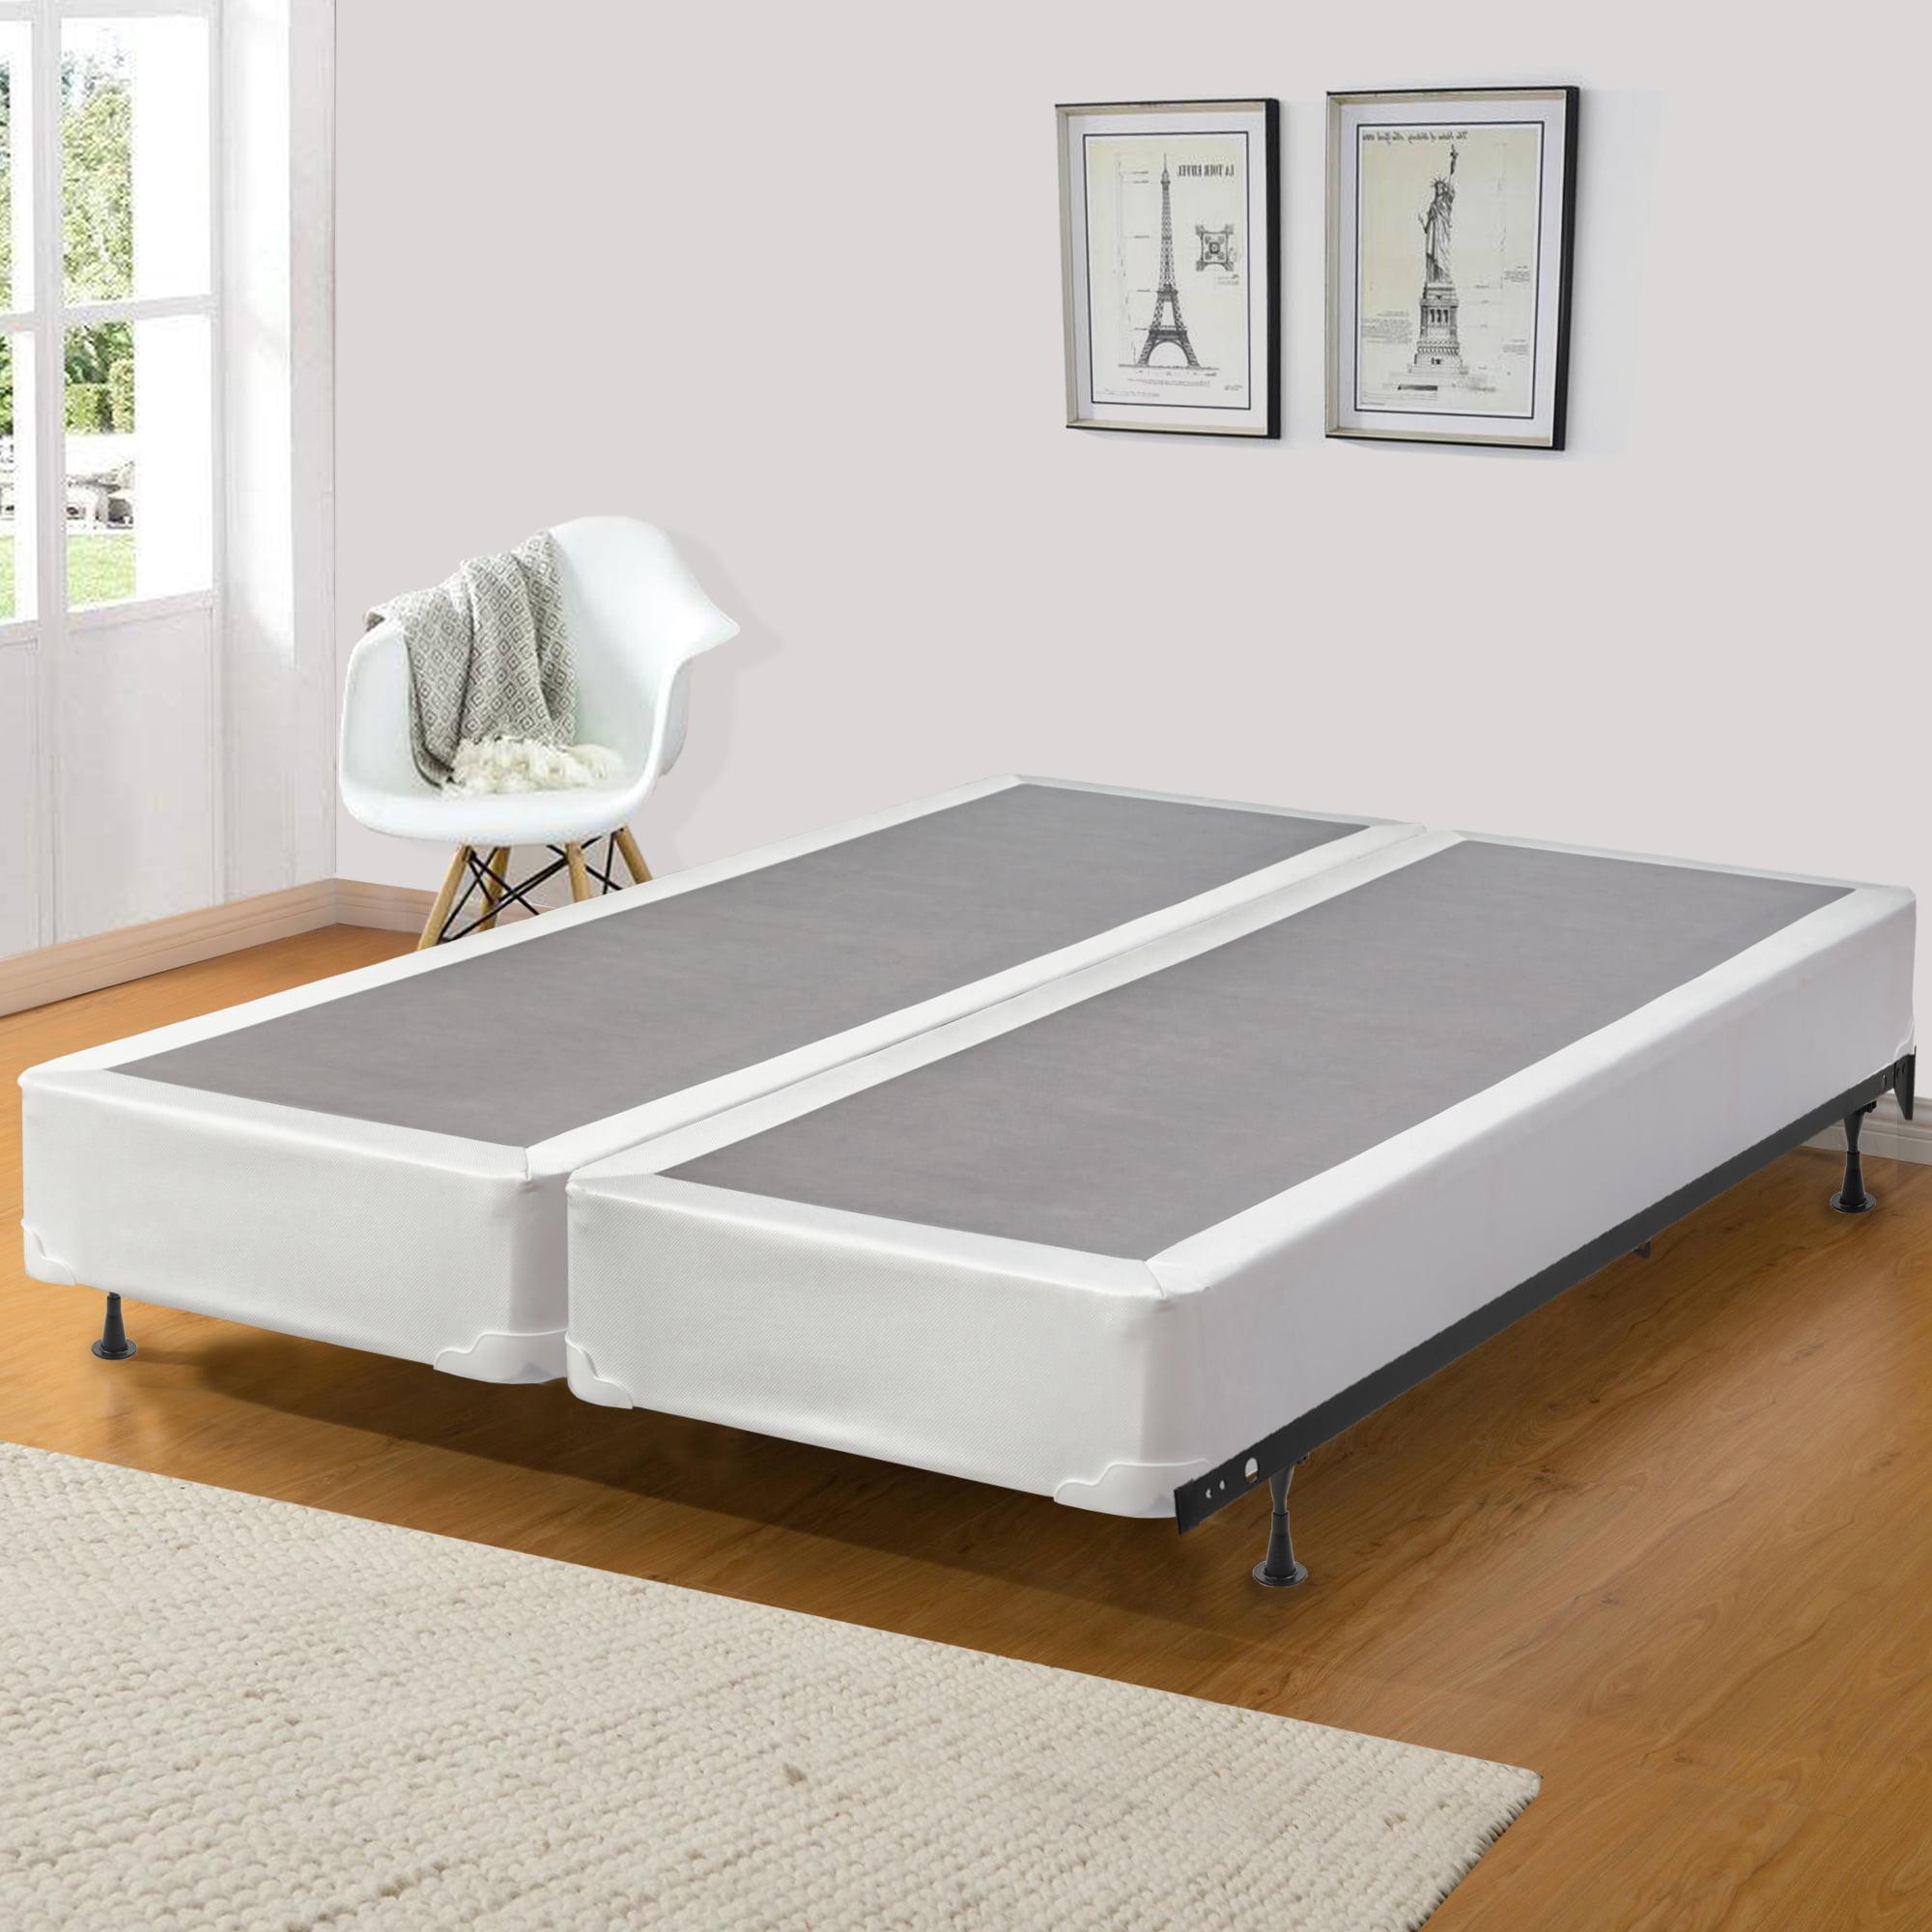 Continental Sleep, 8 Inch Wood Box Spring/Foundation For Mattress